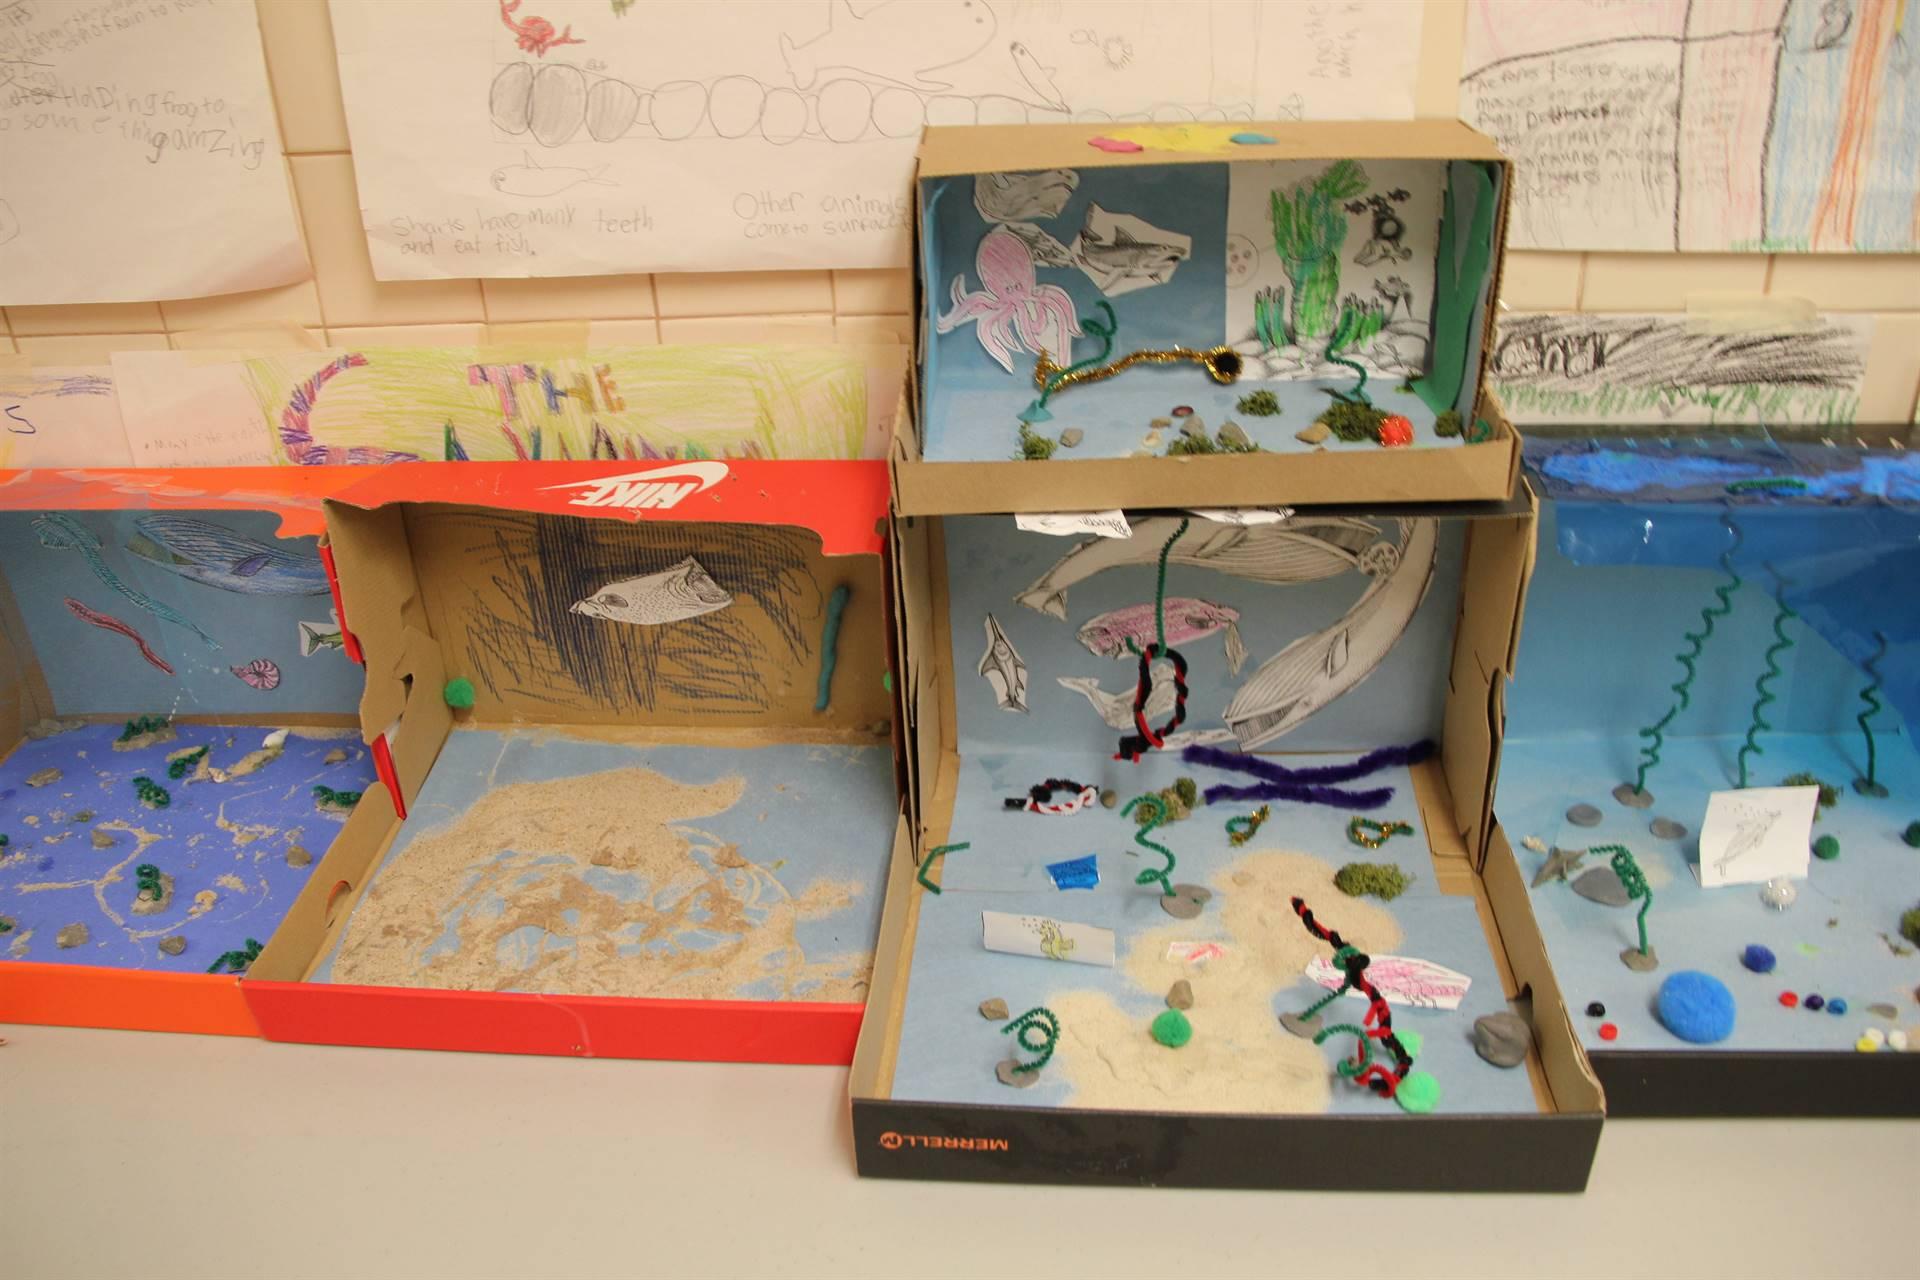 Ocean habitat project images for Habitat container